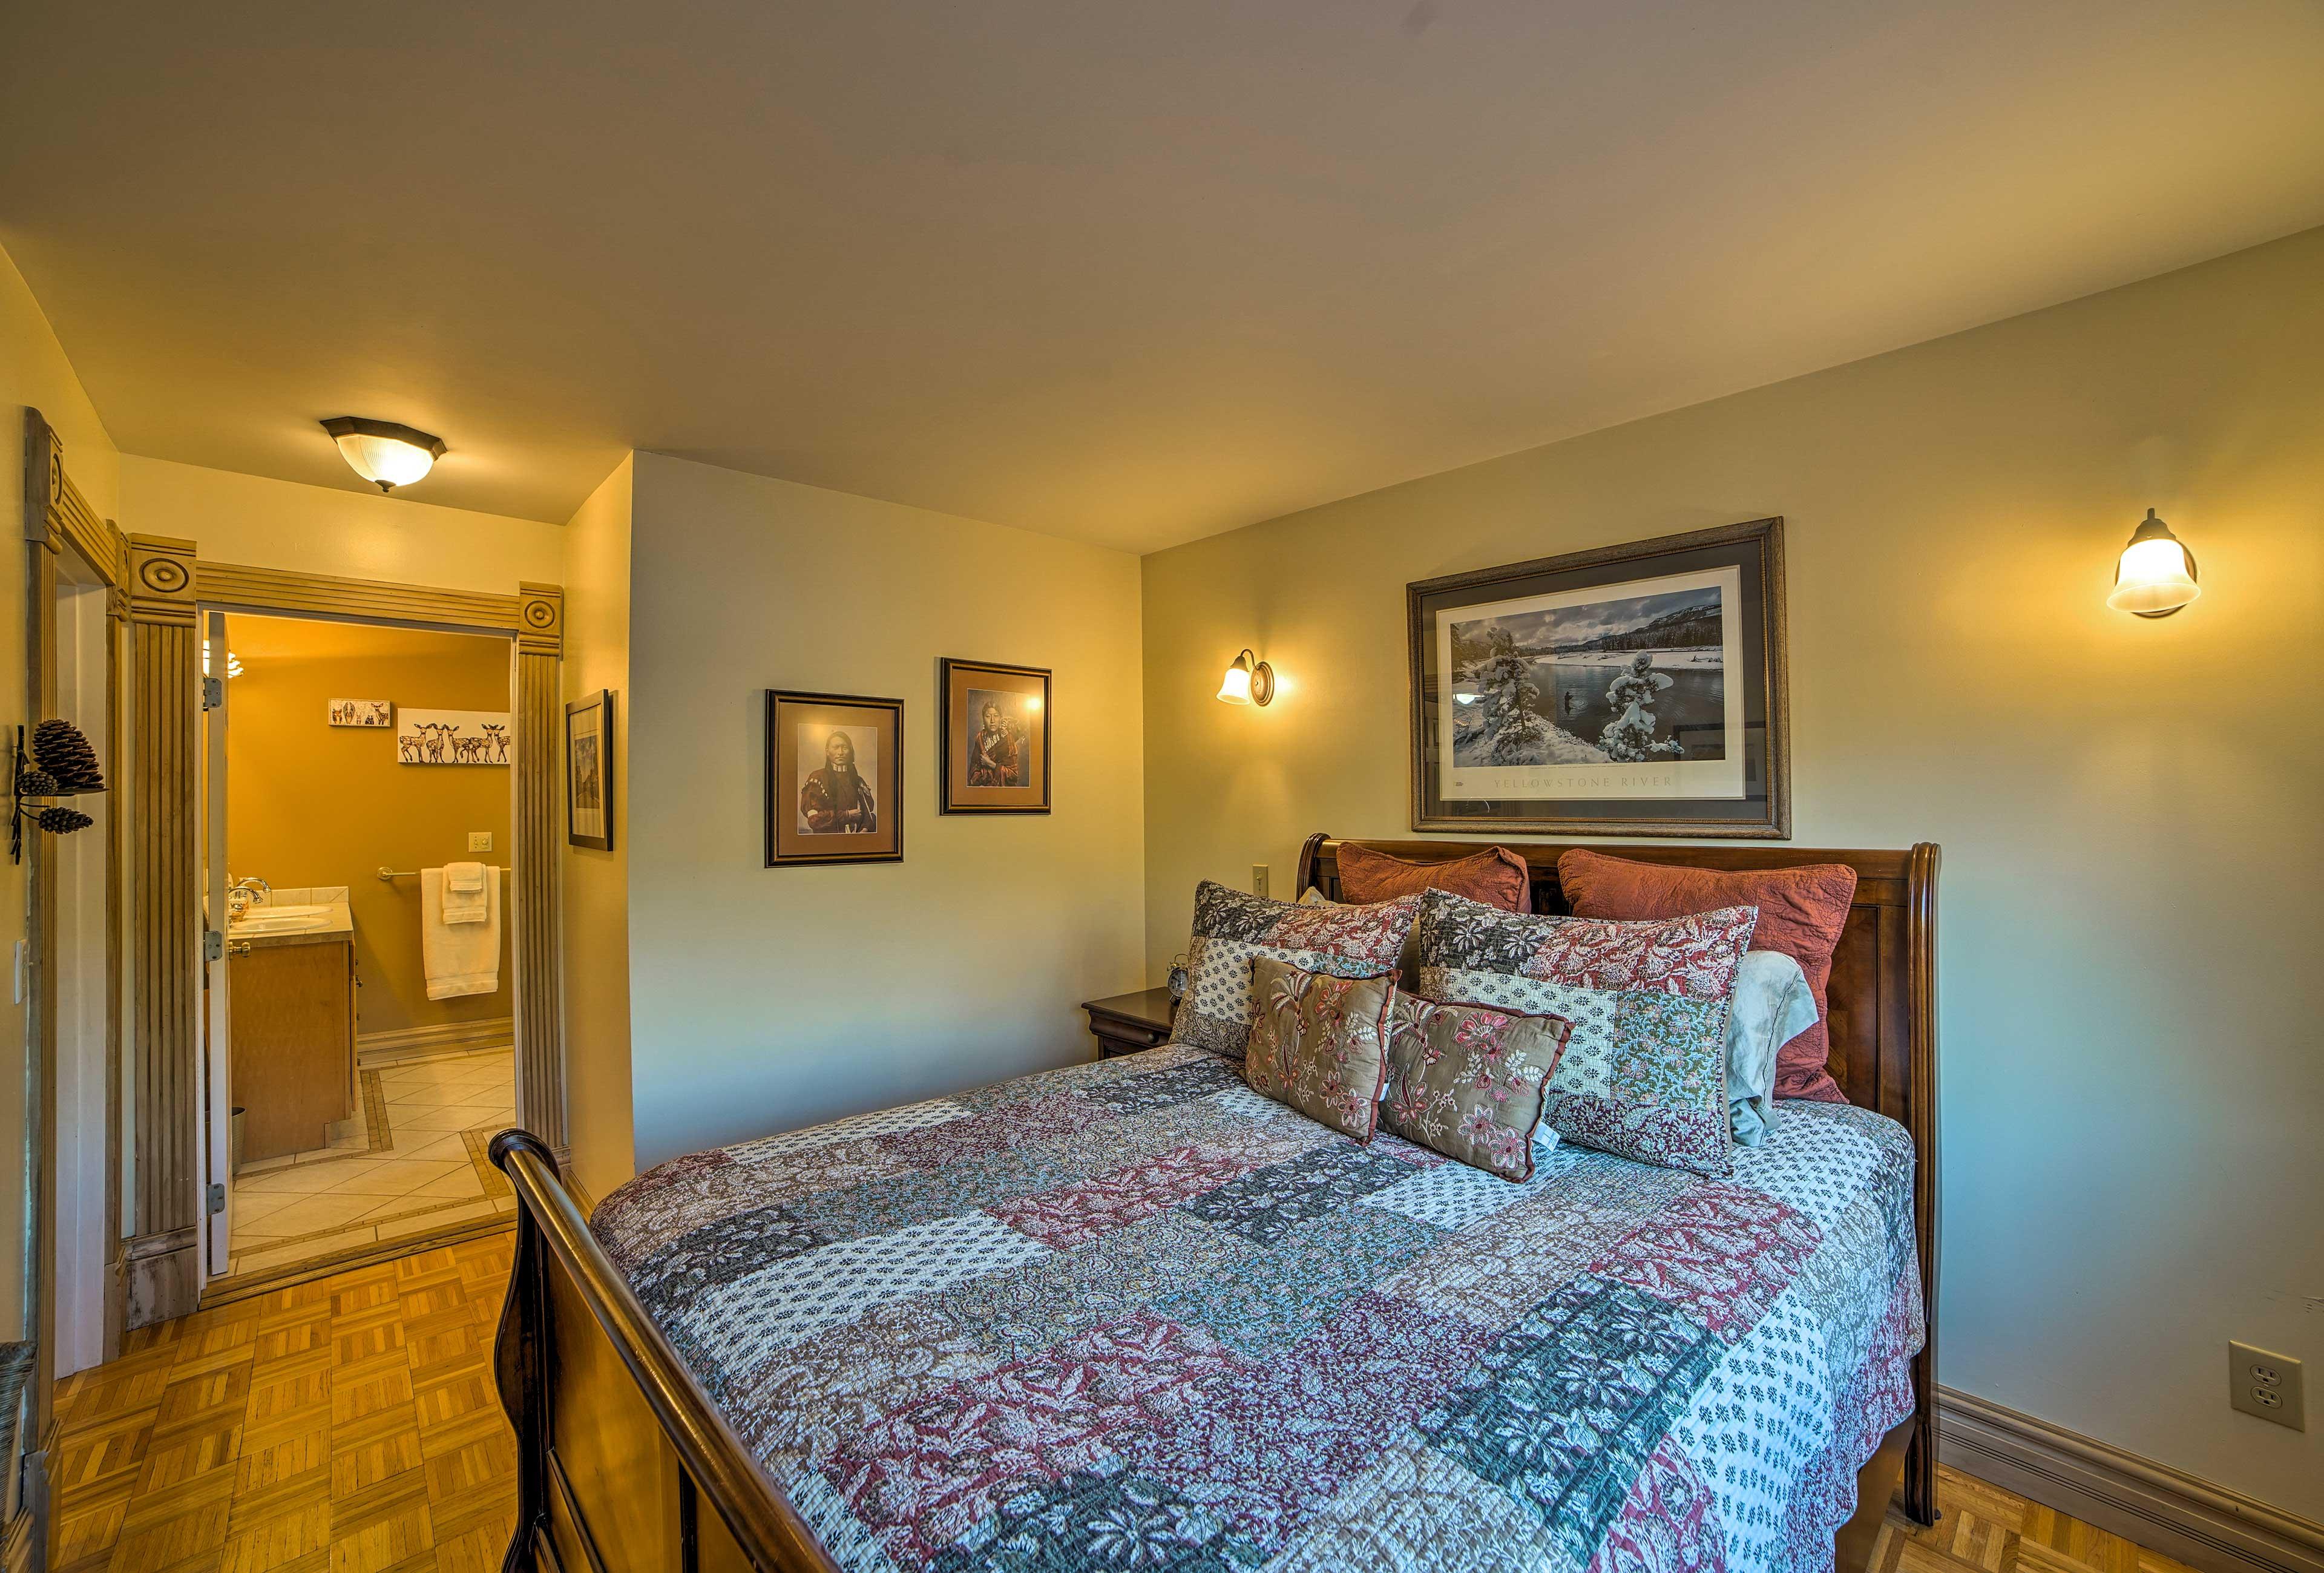 Enjoy the convenience of an en-suite bathroom in the back bedroom.